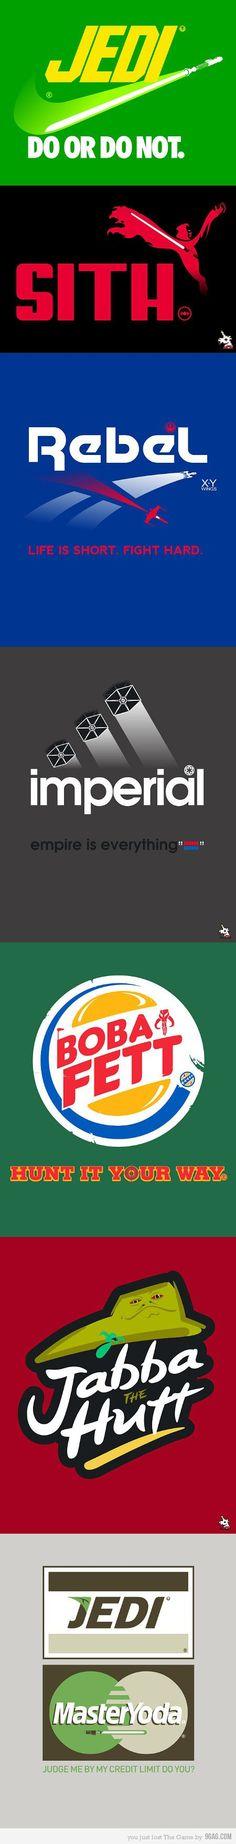 Star Wars Advertisements